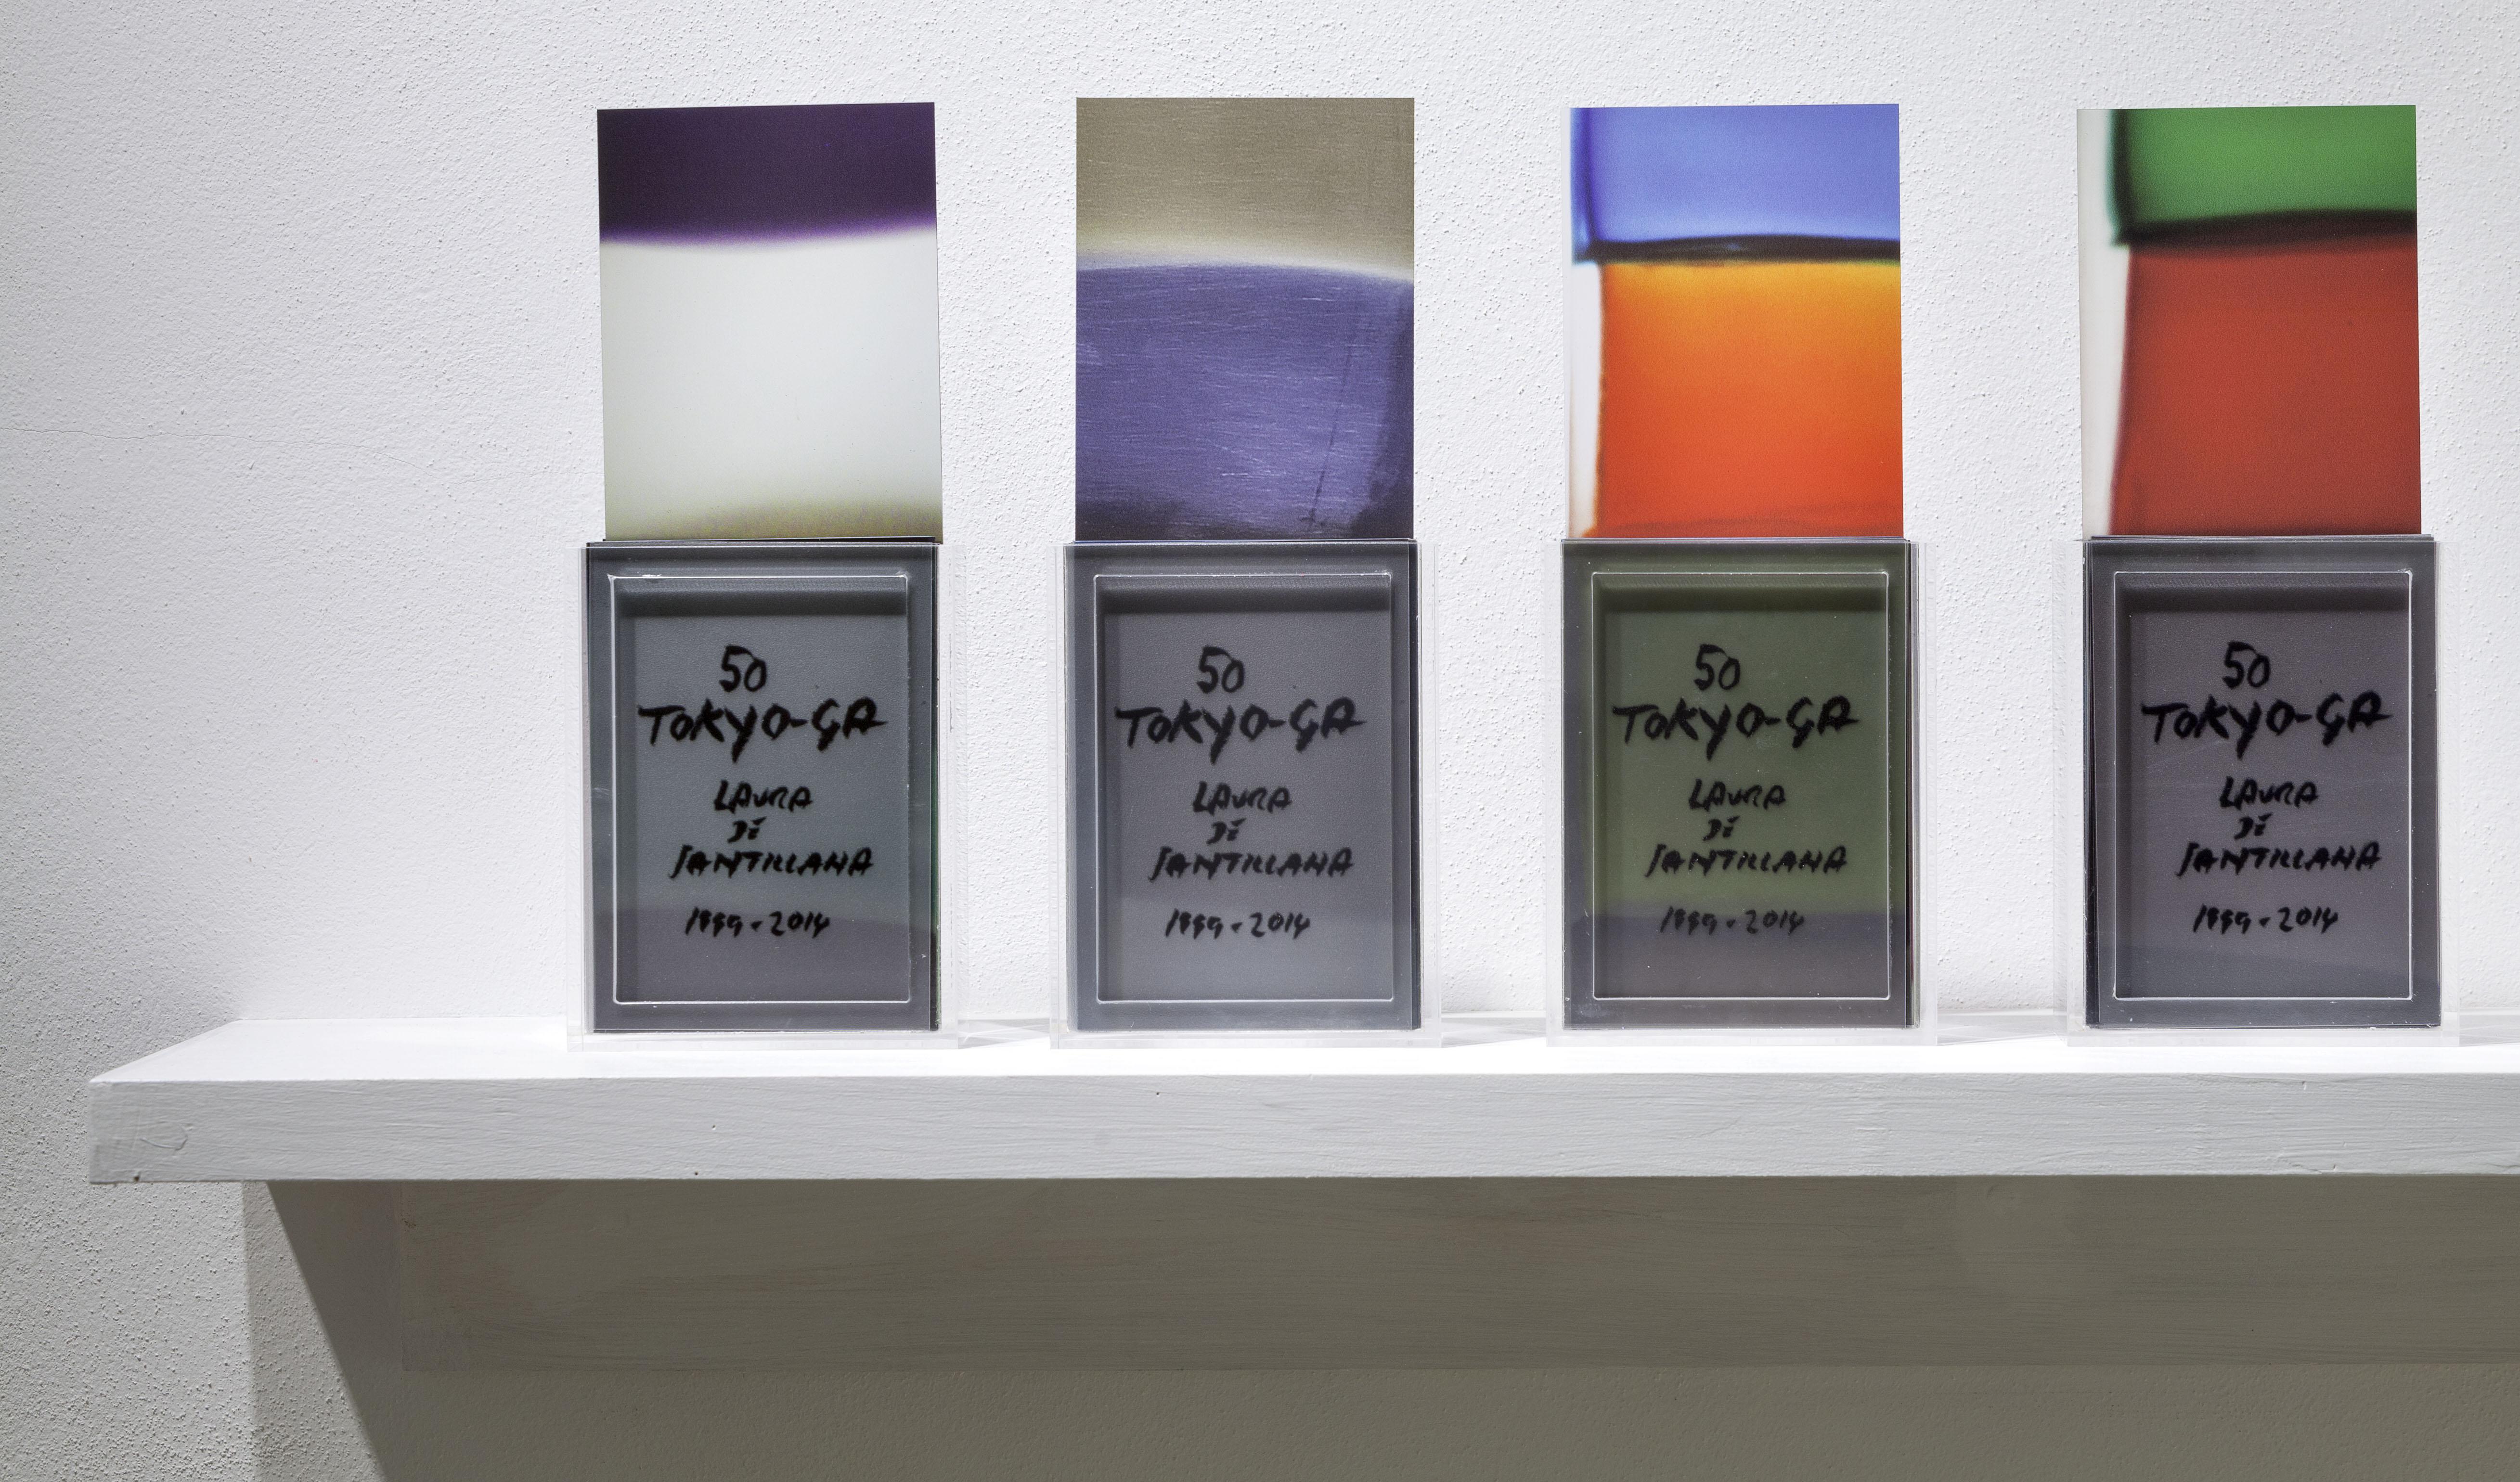 Installation view, Marignana Arte, Hour-Glass, Alessandro Diaz De Santillana & Laura De Santillana, Tokyo-Ga, 2014, Artist's book of 160 foils